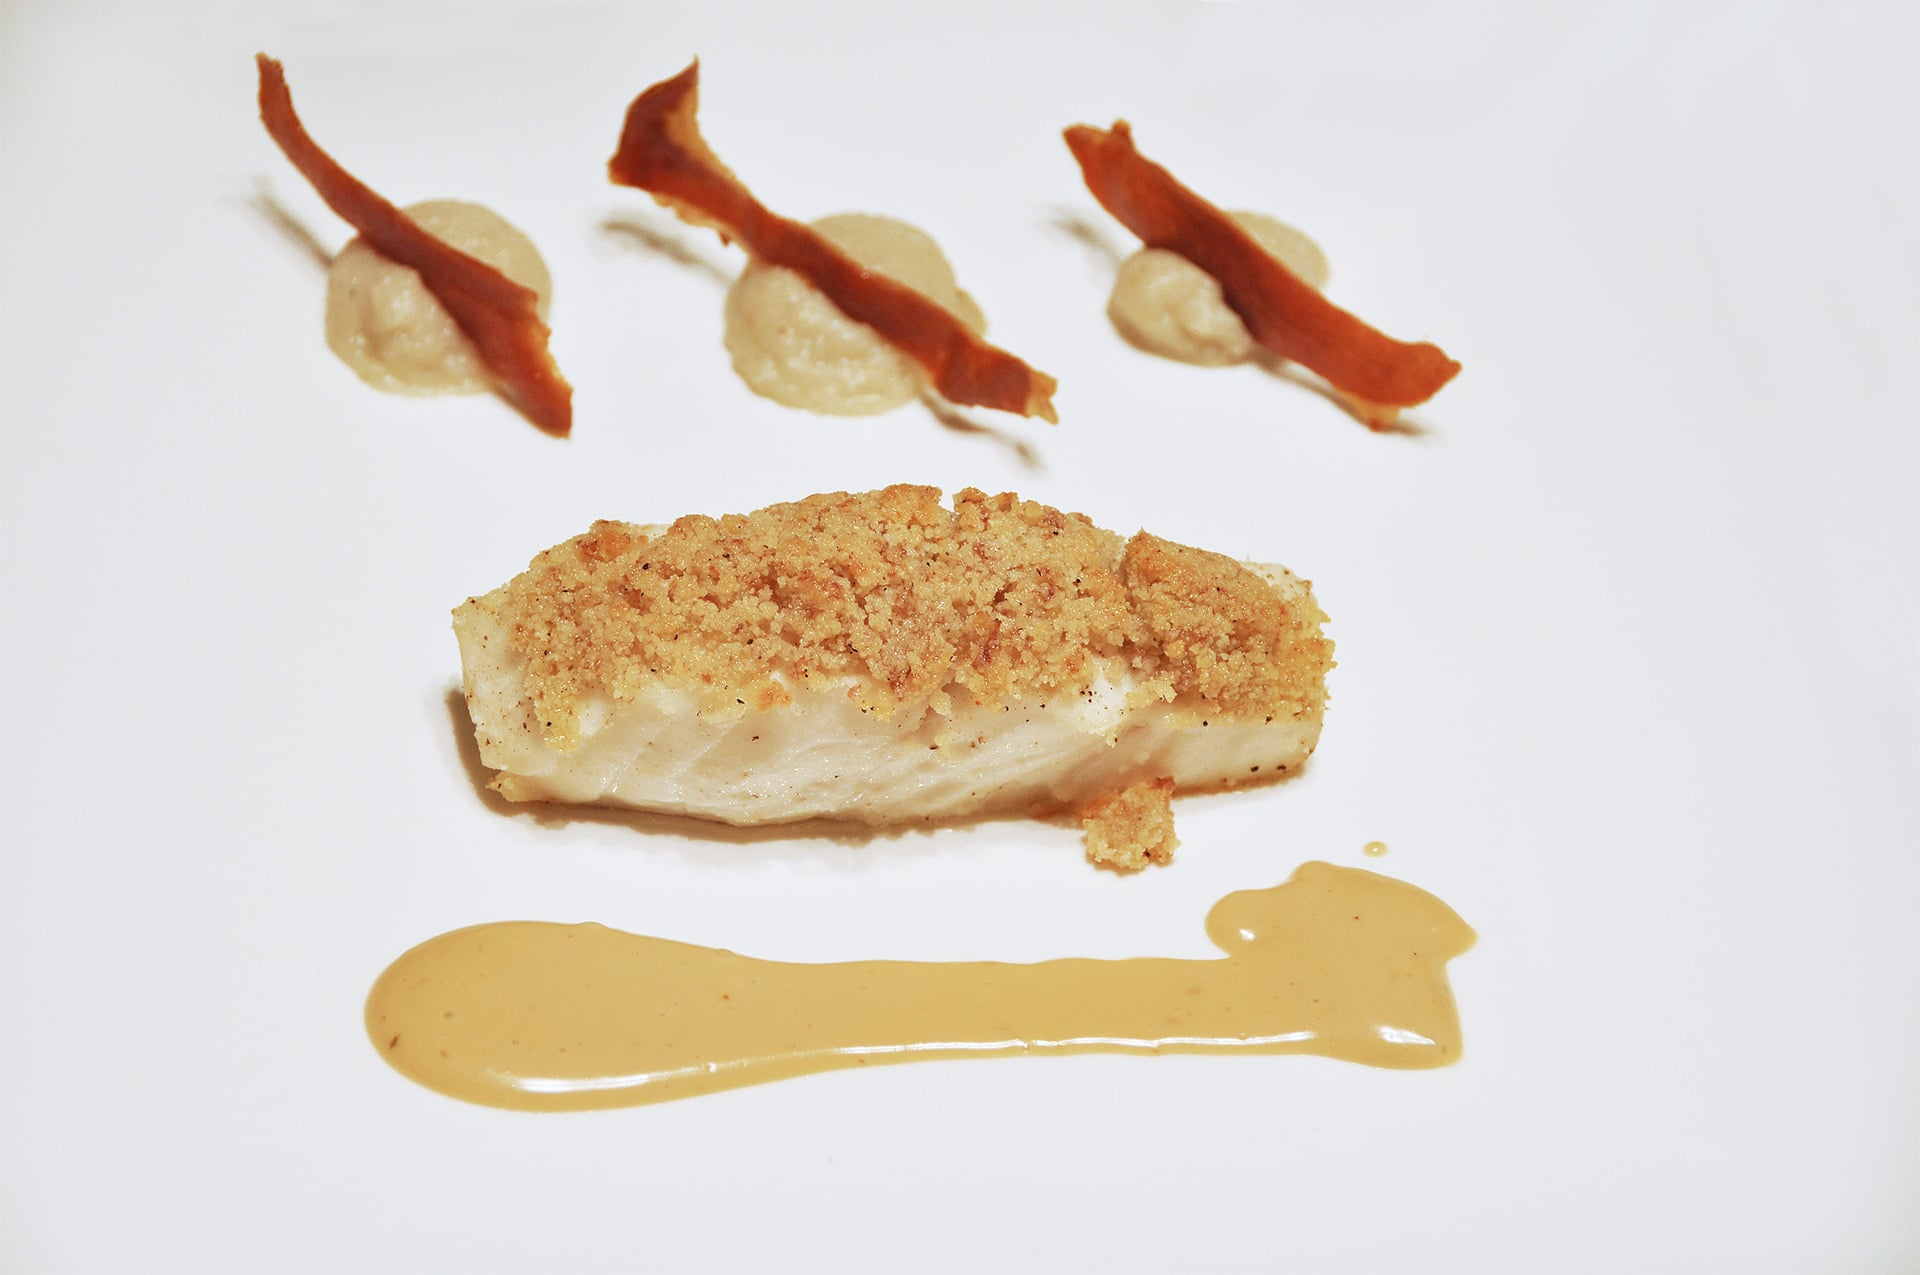 Catering - Salons 't Groenhof